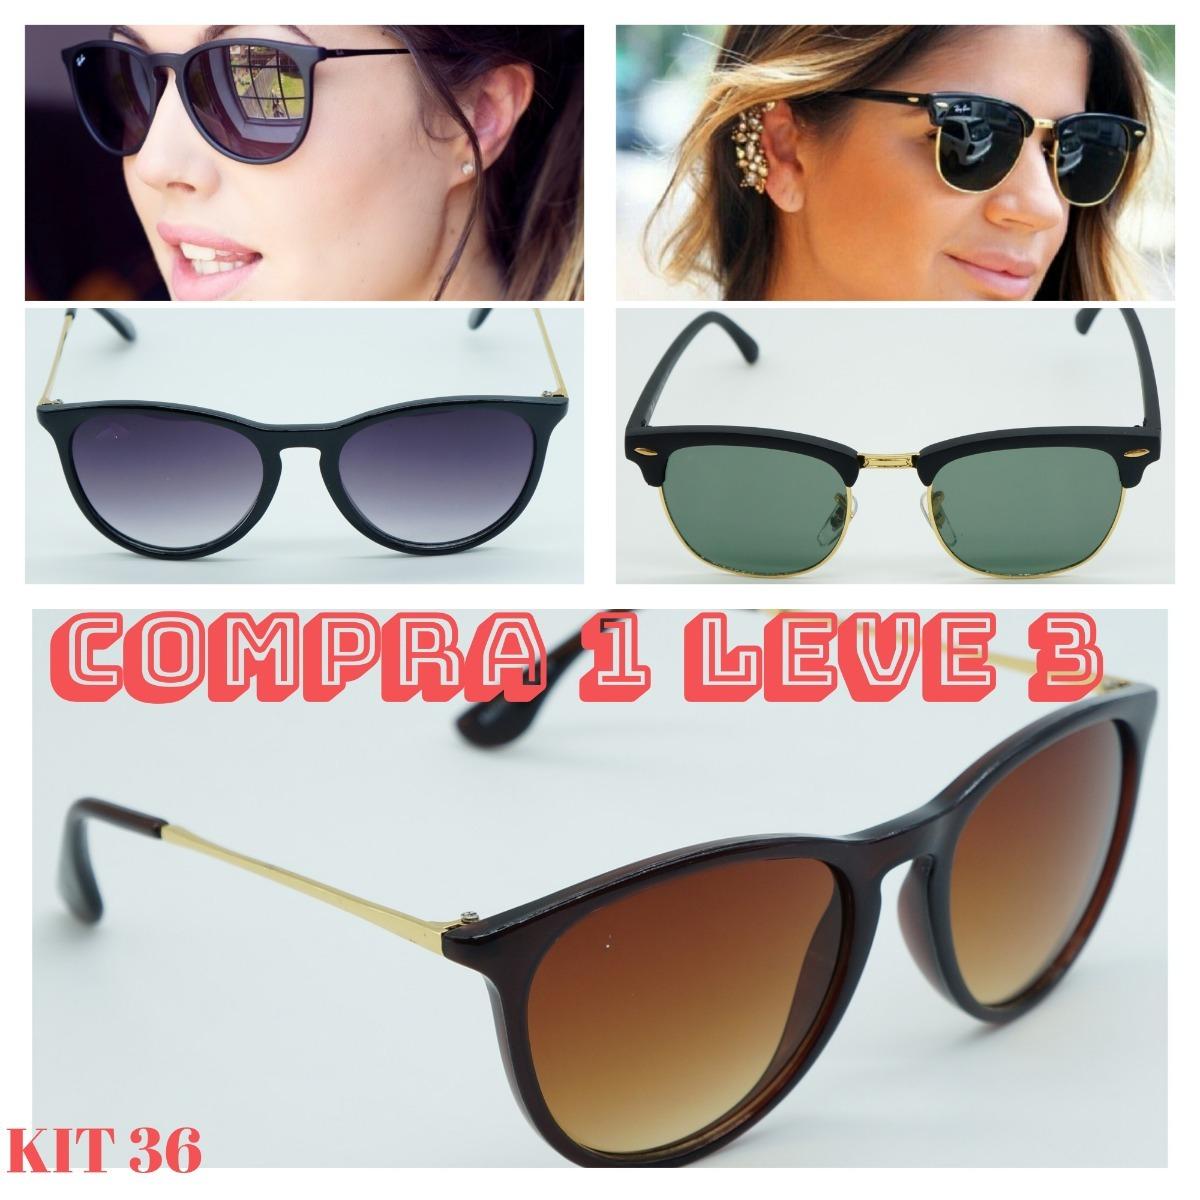 6e68426ec óculos sol feminino erika erica cristal clubmaster promoçao. Carregando  zoom.